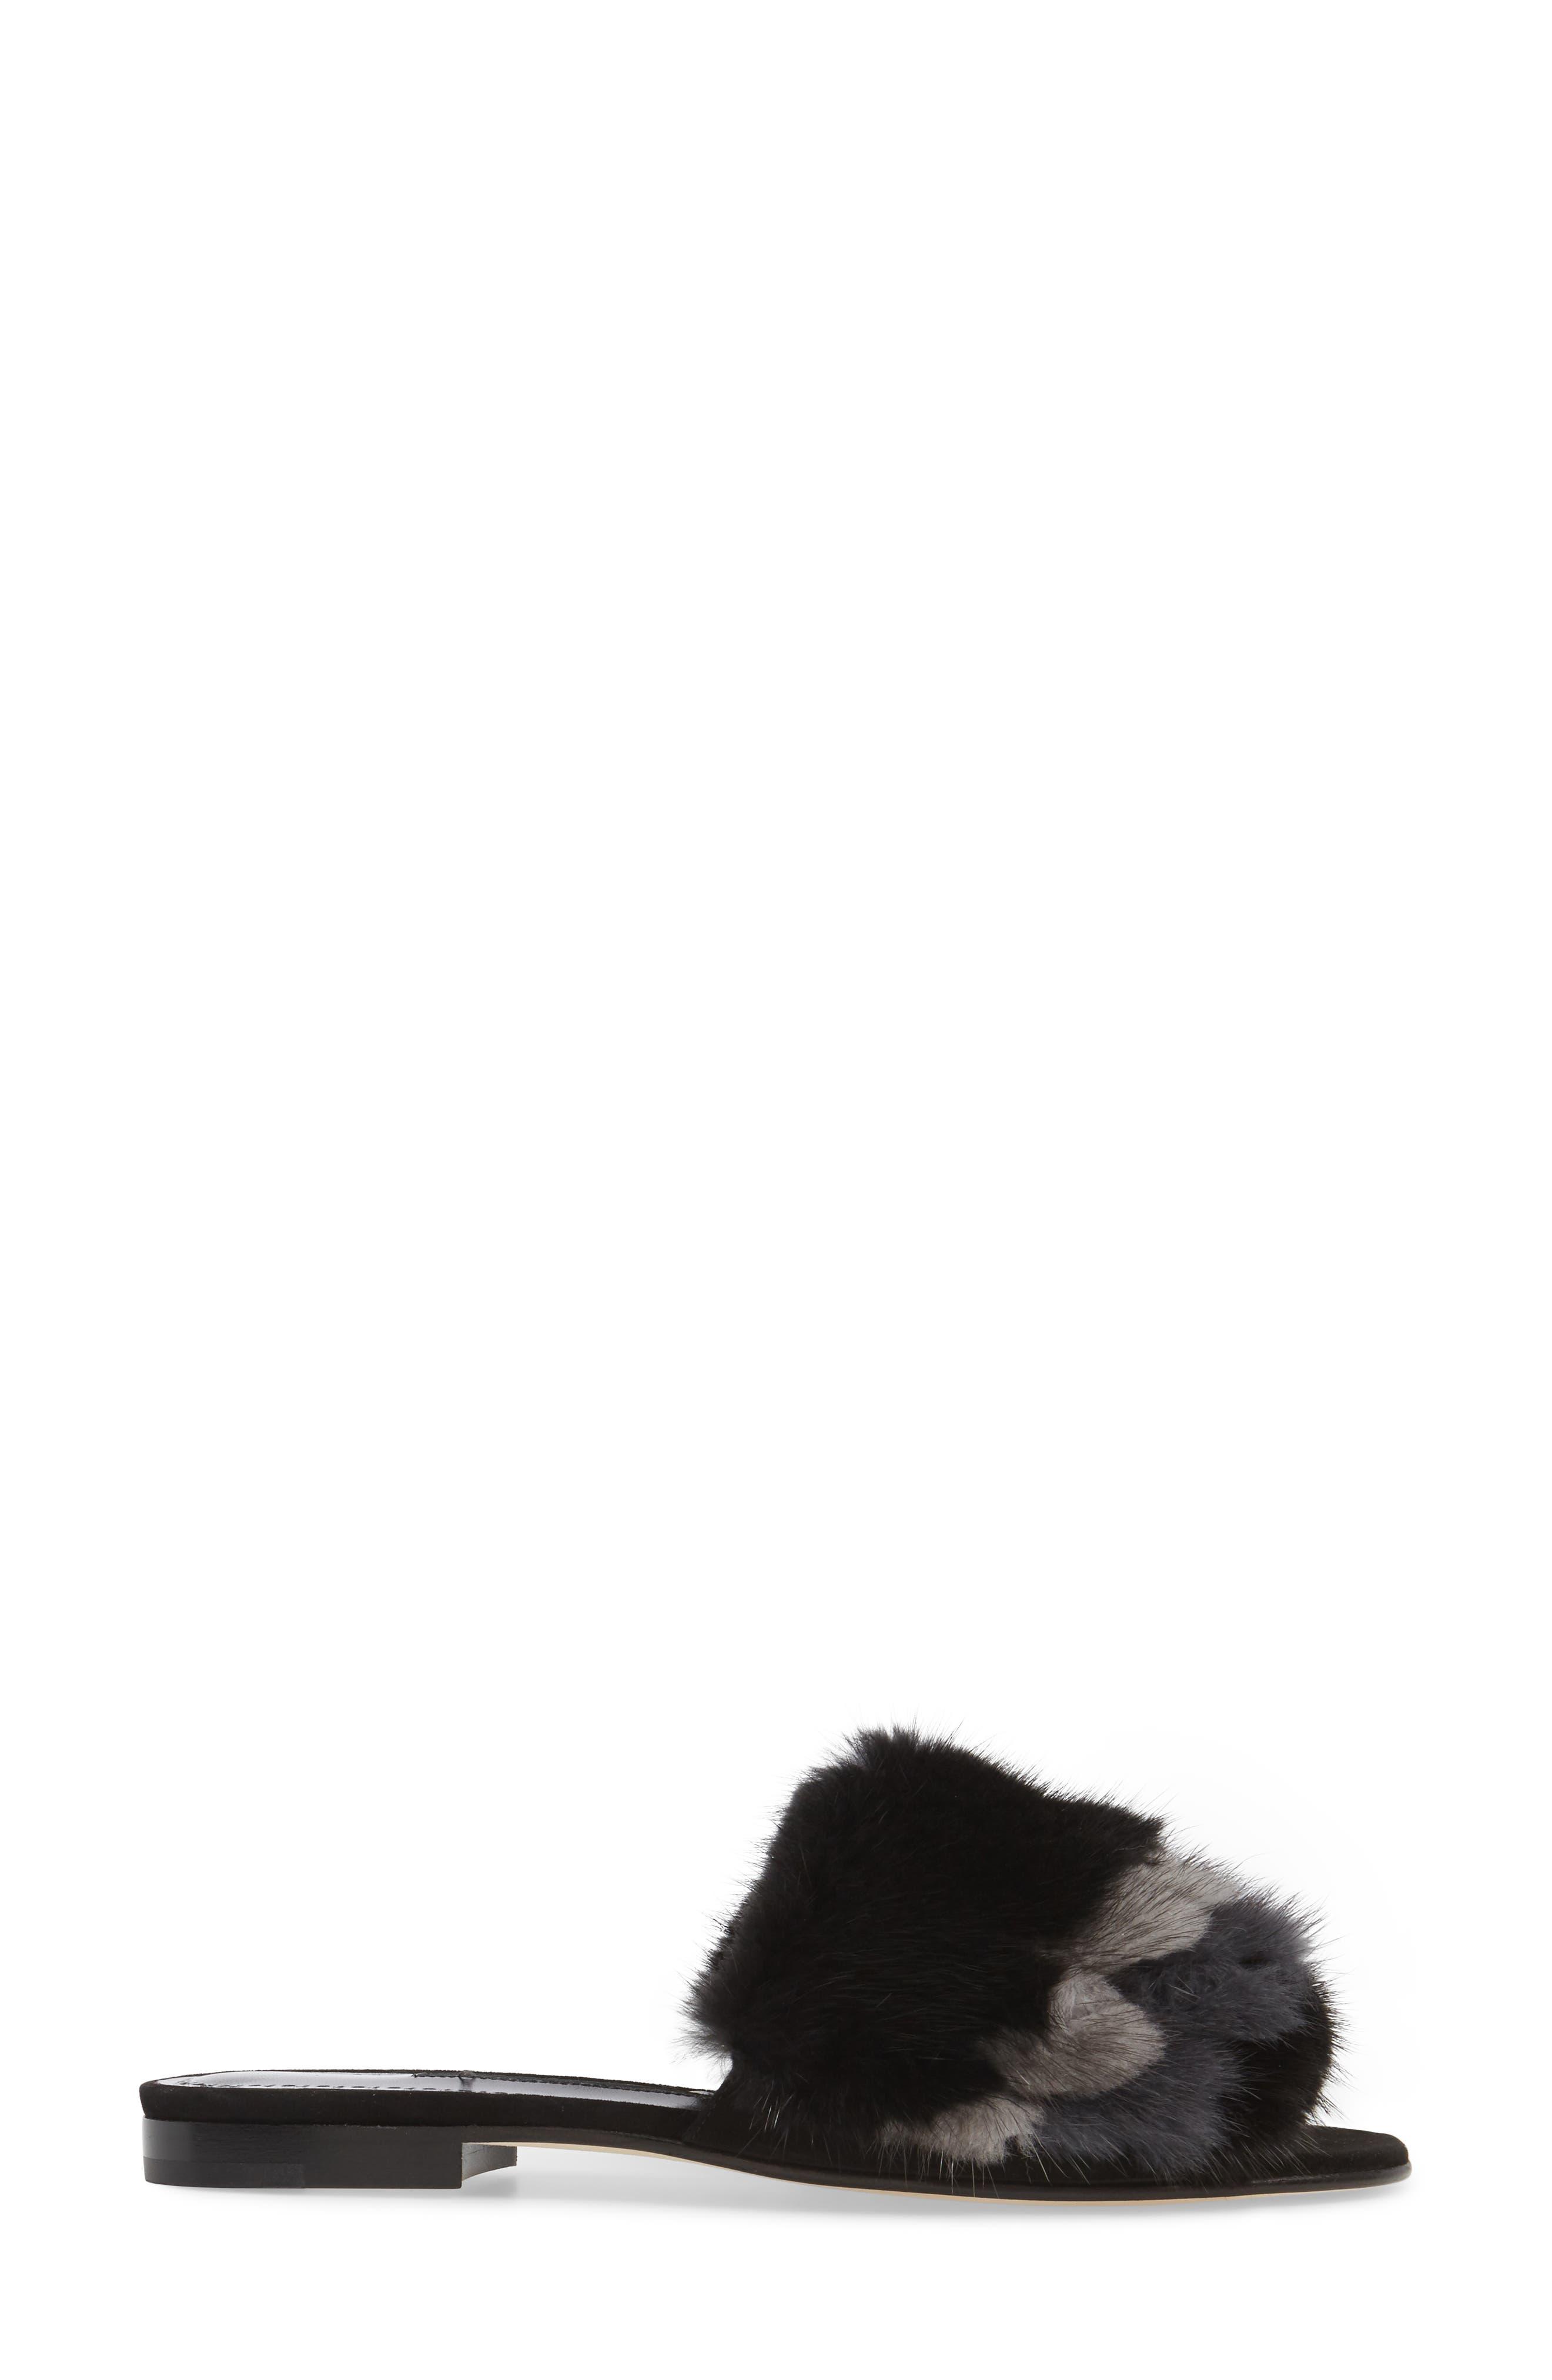 Pelosusmin Genuine Mink Fur Slide Sandal,                             Alternate thumbnail 3, color,                             001